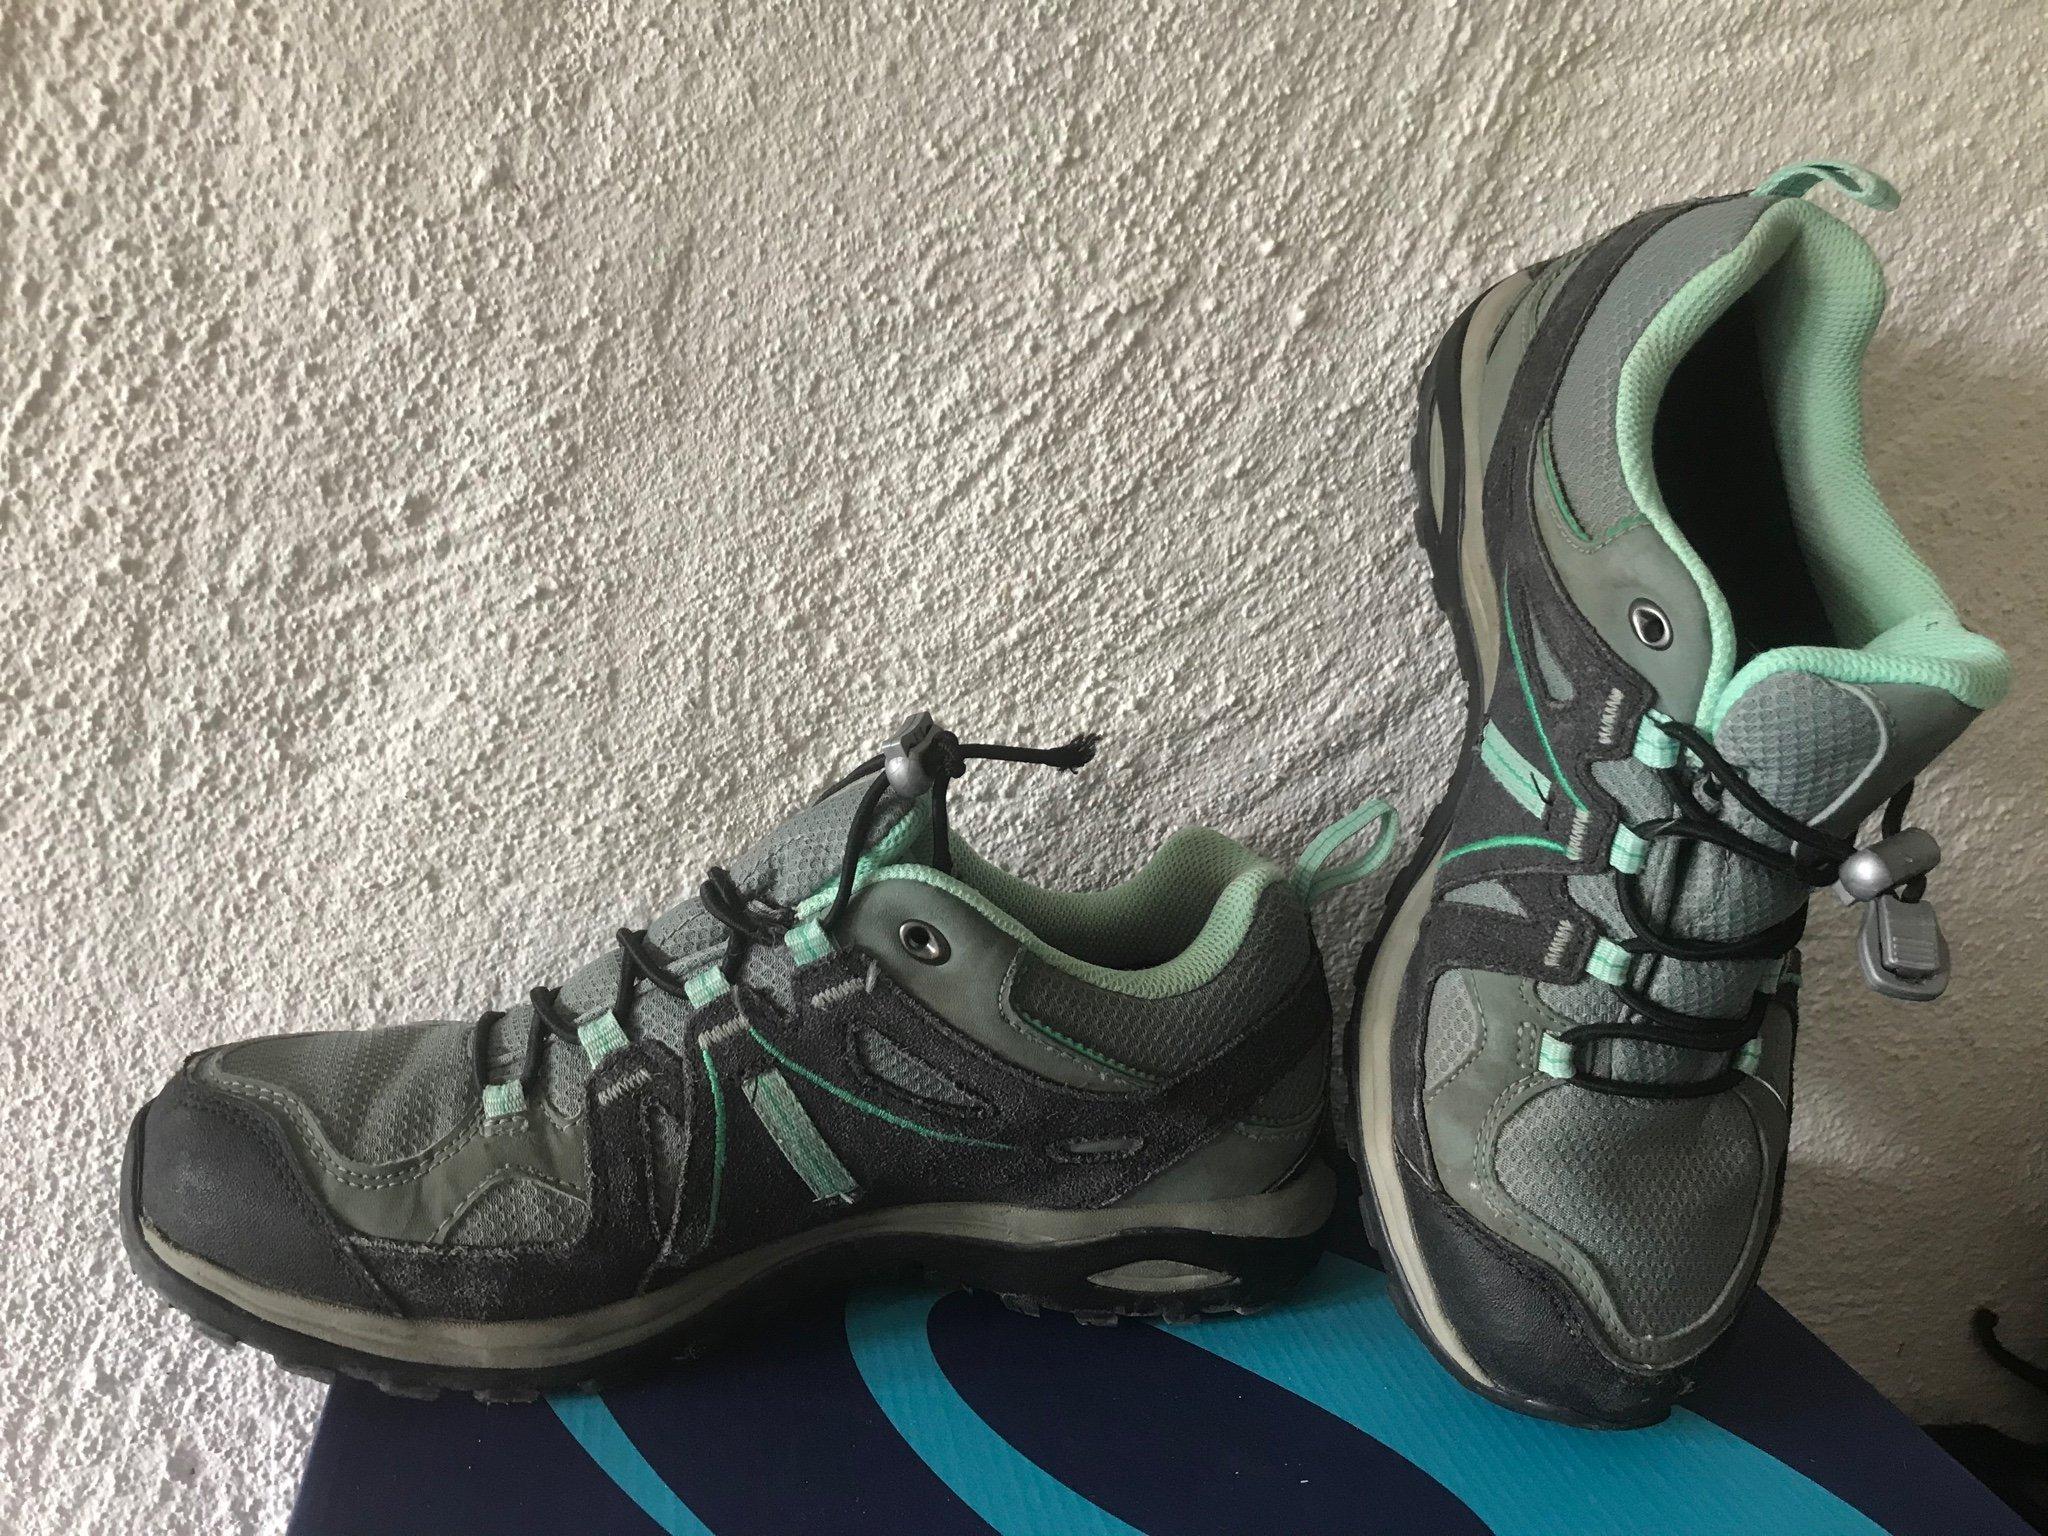 Fina Salomon skor i storlek 39 13